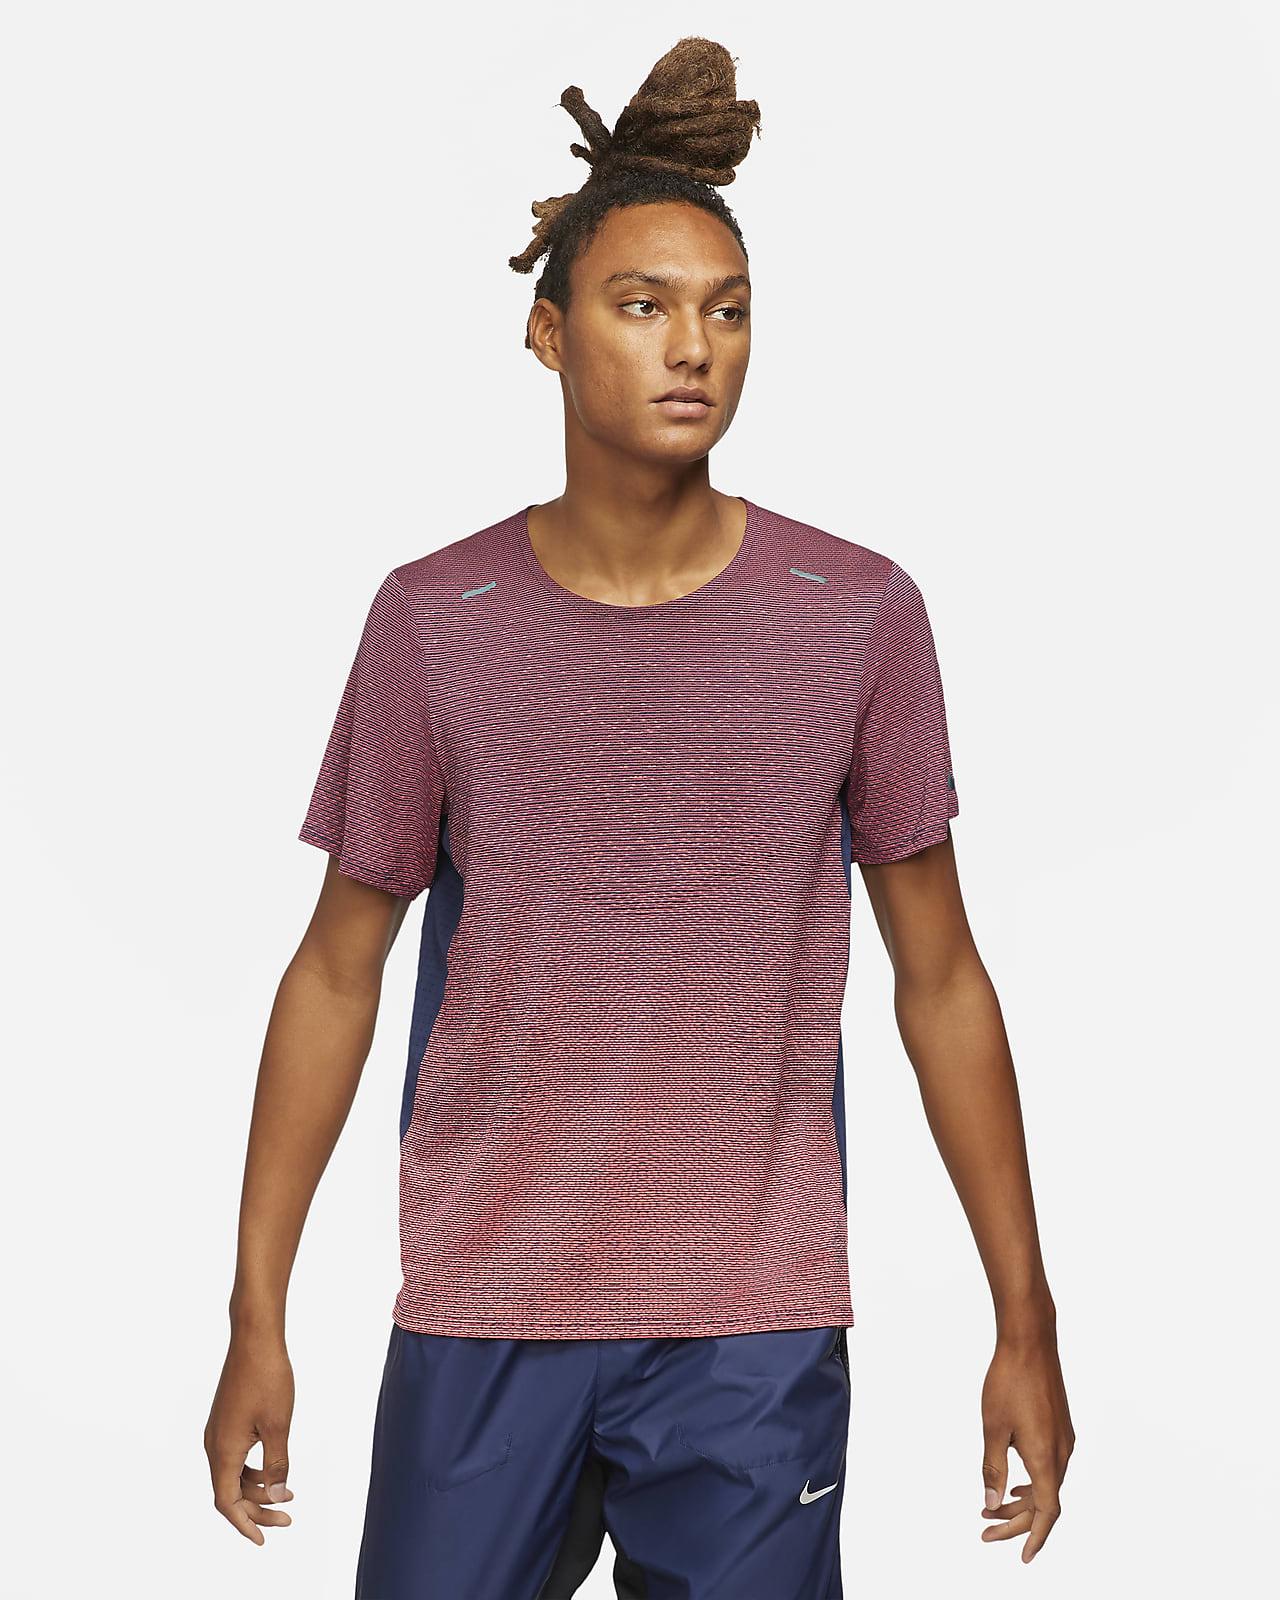 Męska koszulka z krótkim rękawem do biegania Nike Pinnacle Run Division